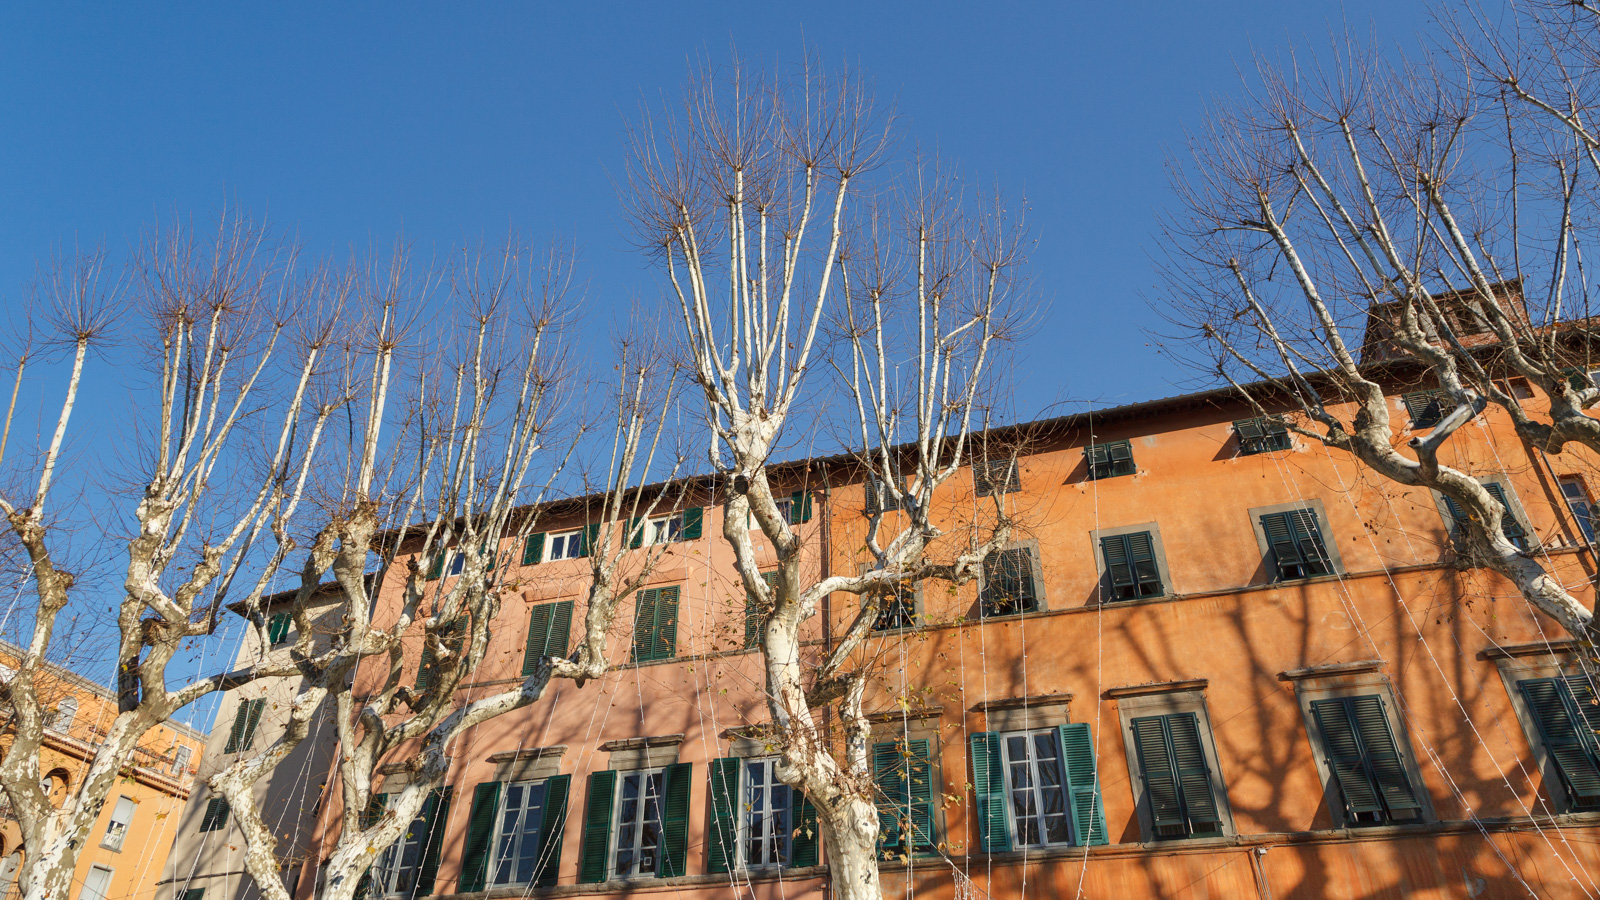 Via Cittadella